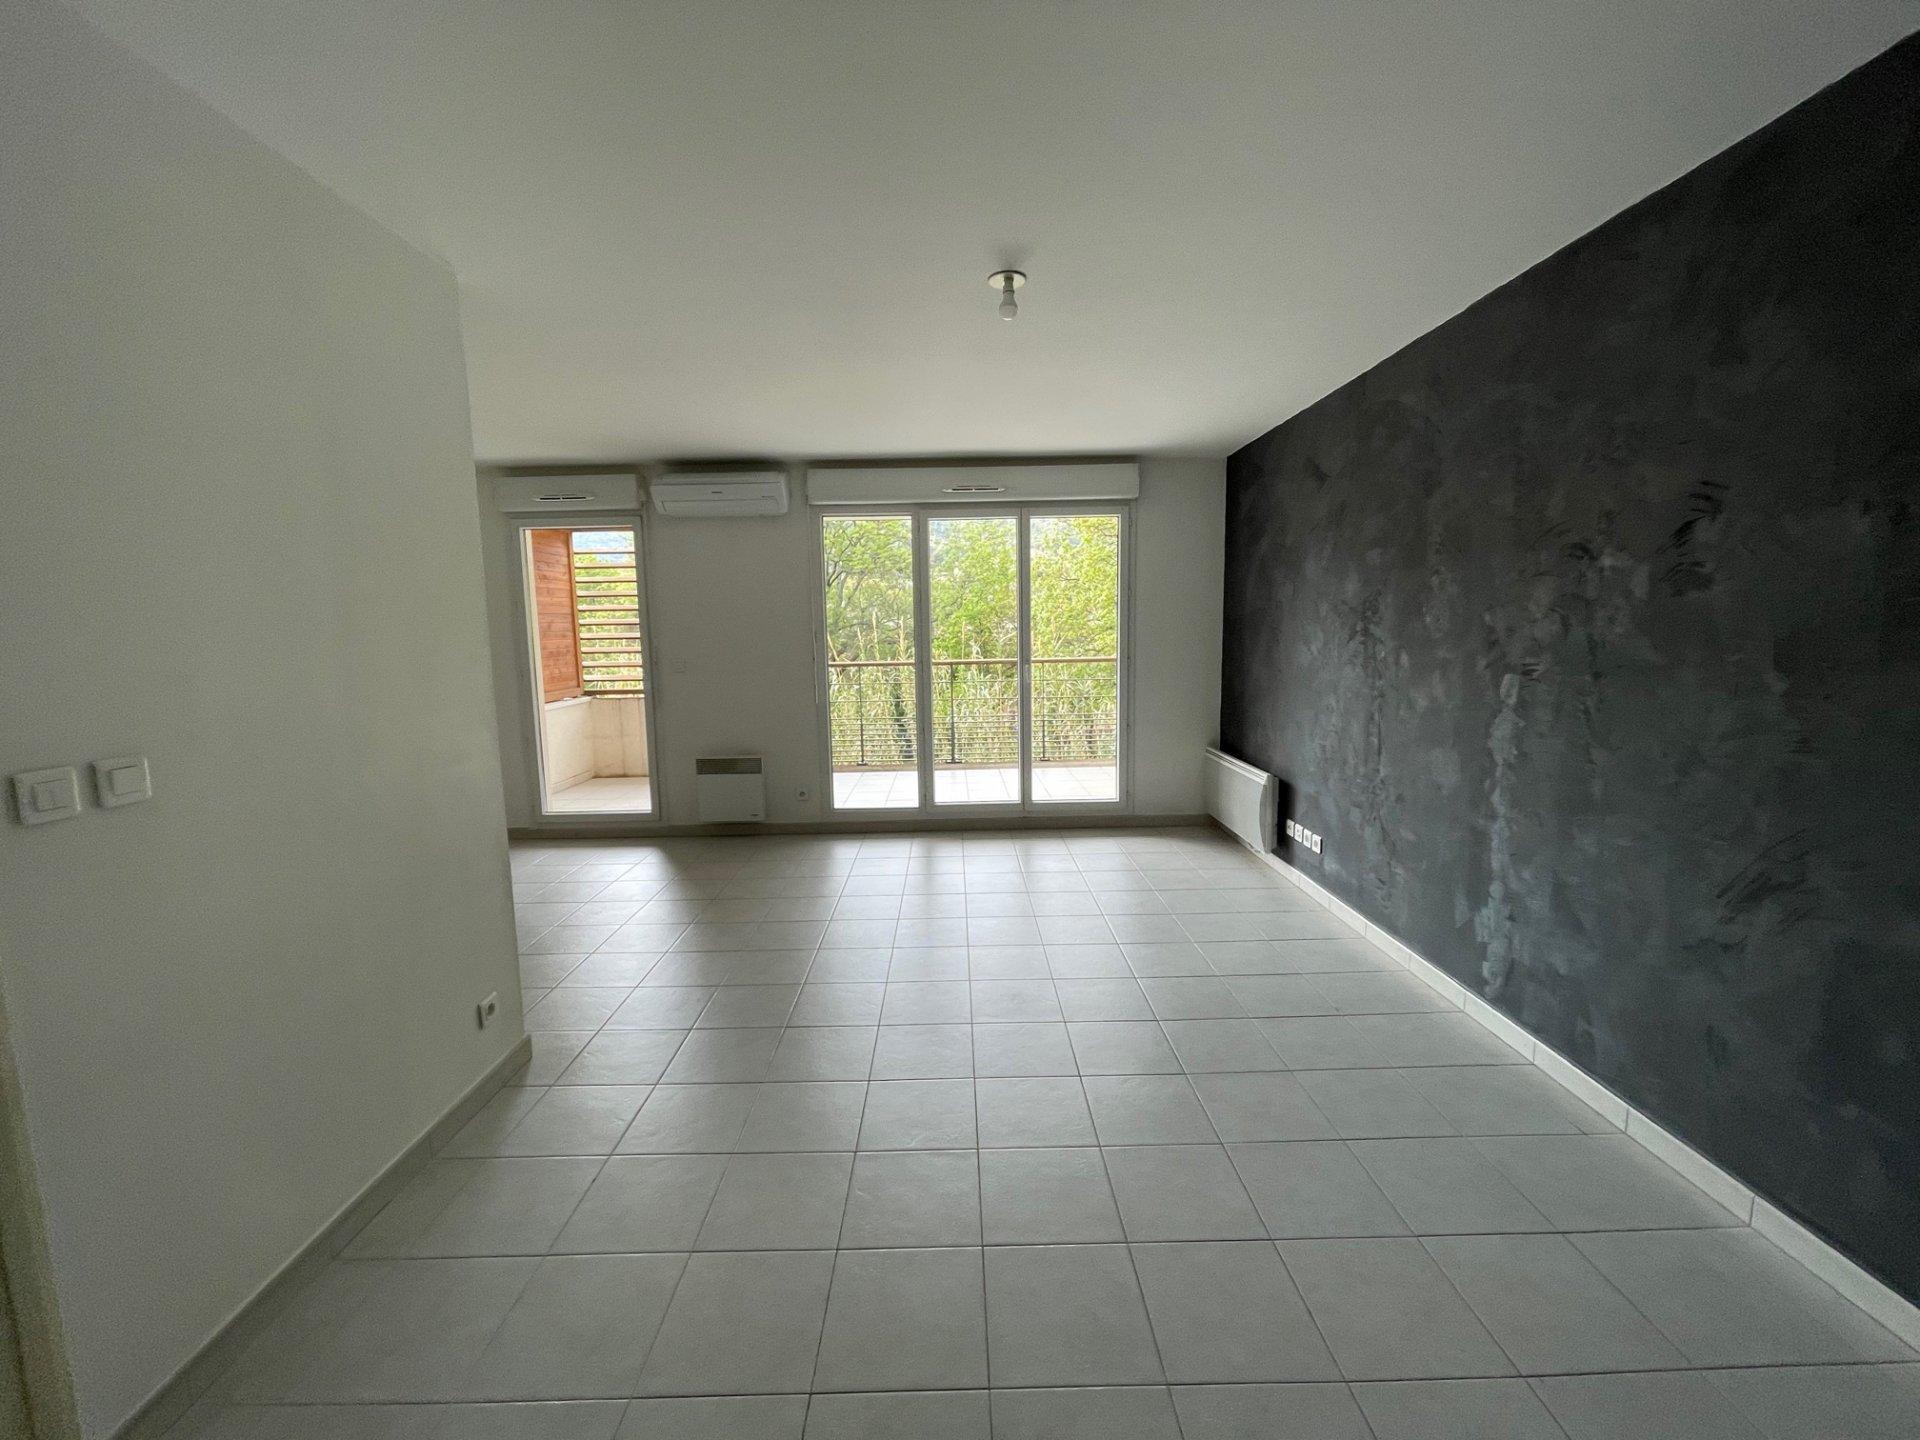 Appartement type 3, 59.90m², deux chambres, terrasse, box, parking